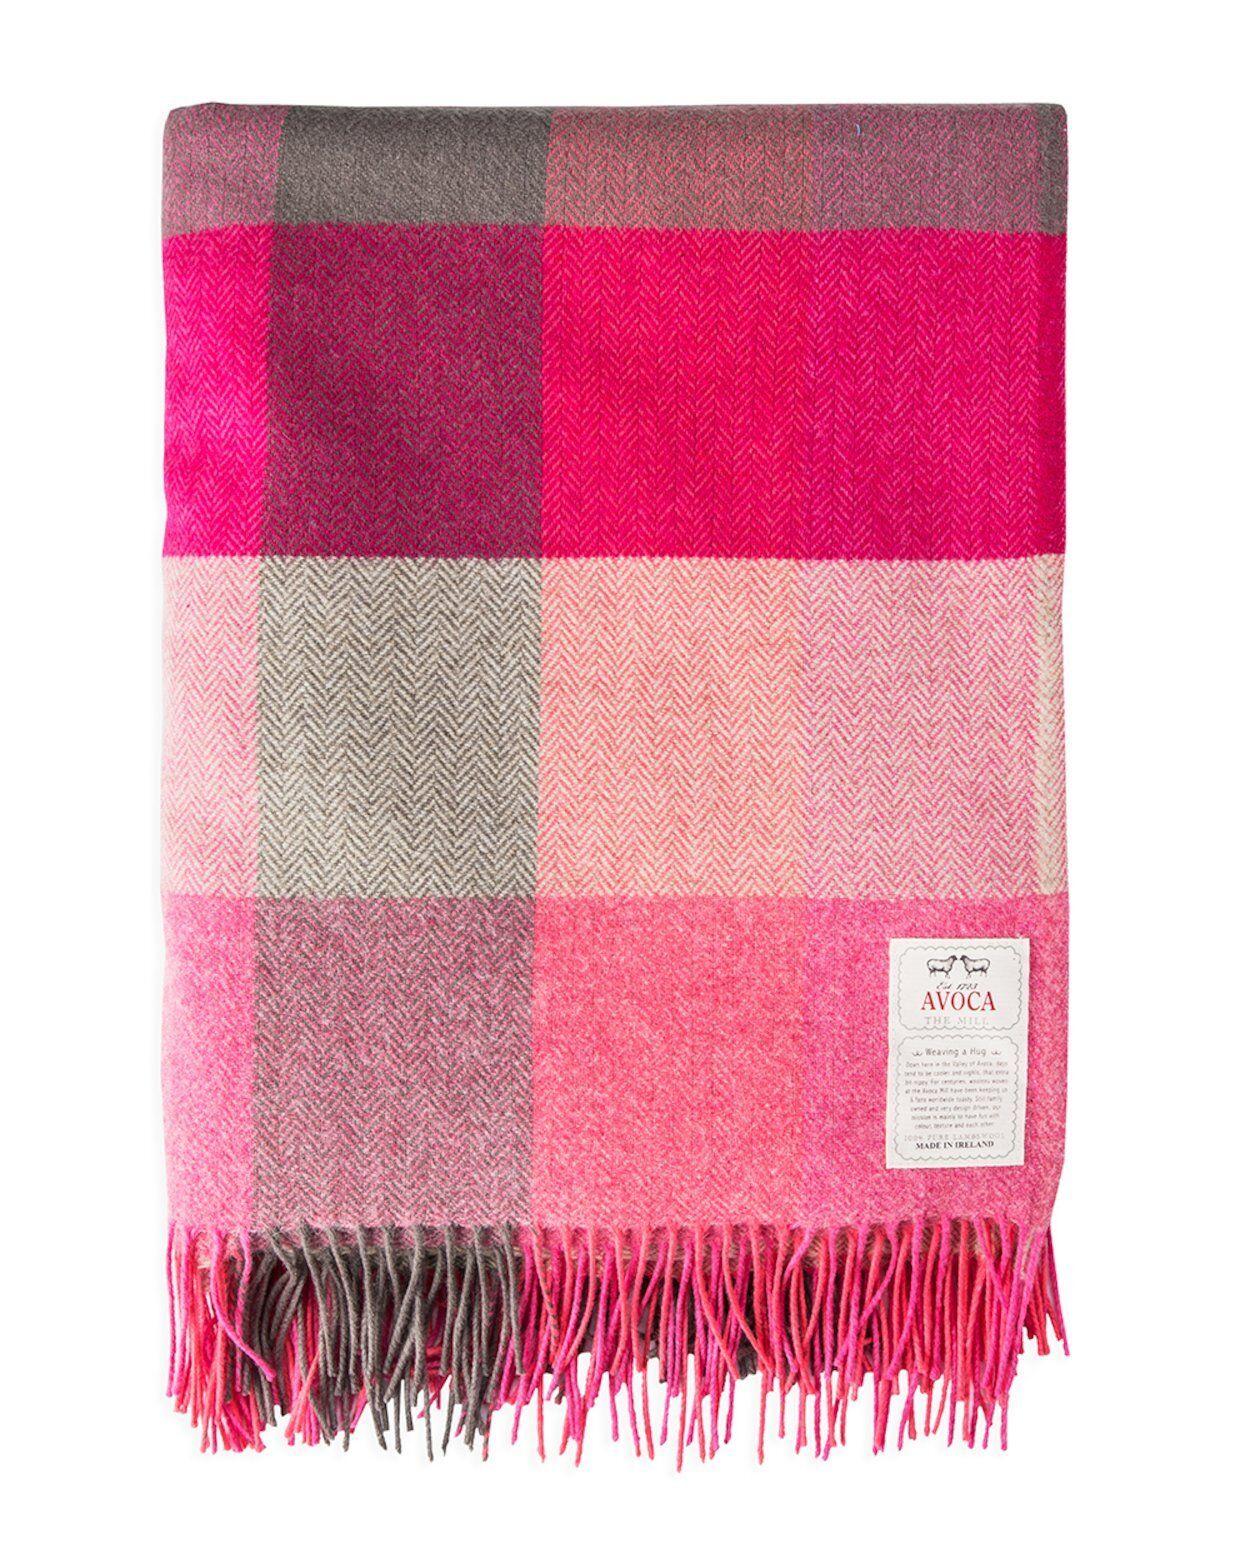 100% pure laine jeter par Avoca (Design  Rose des Champs) - Made in Ireland